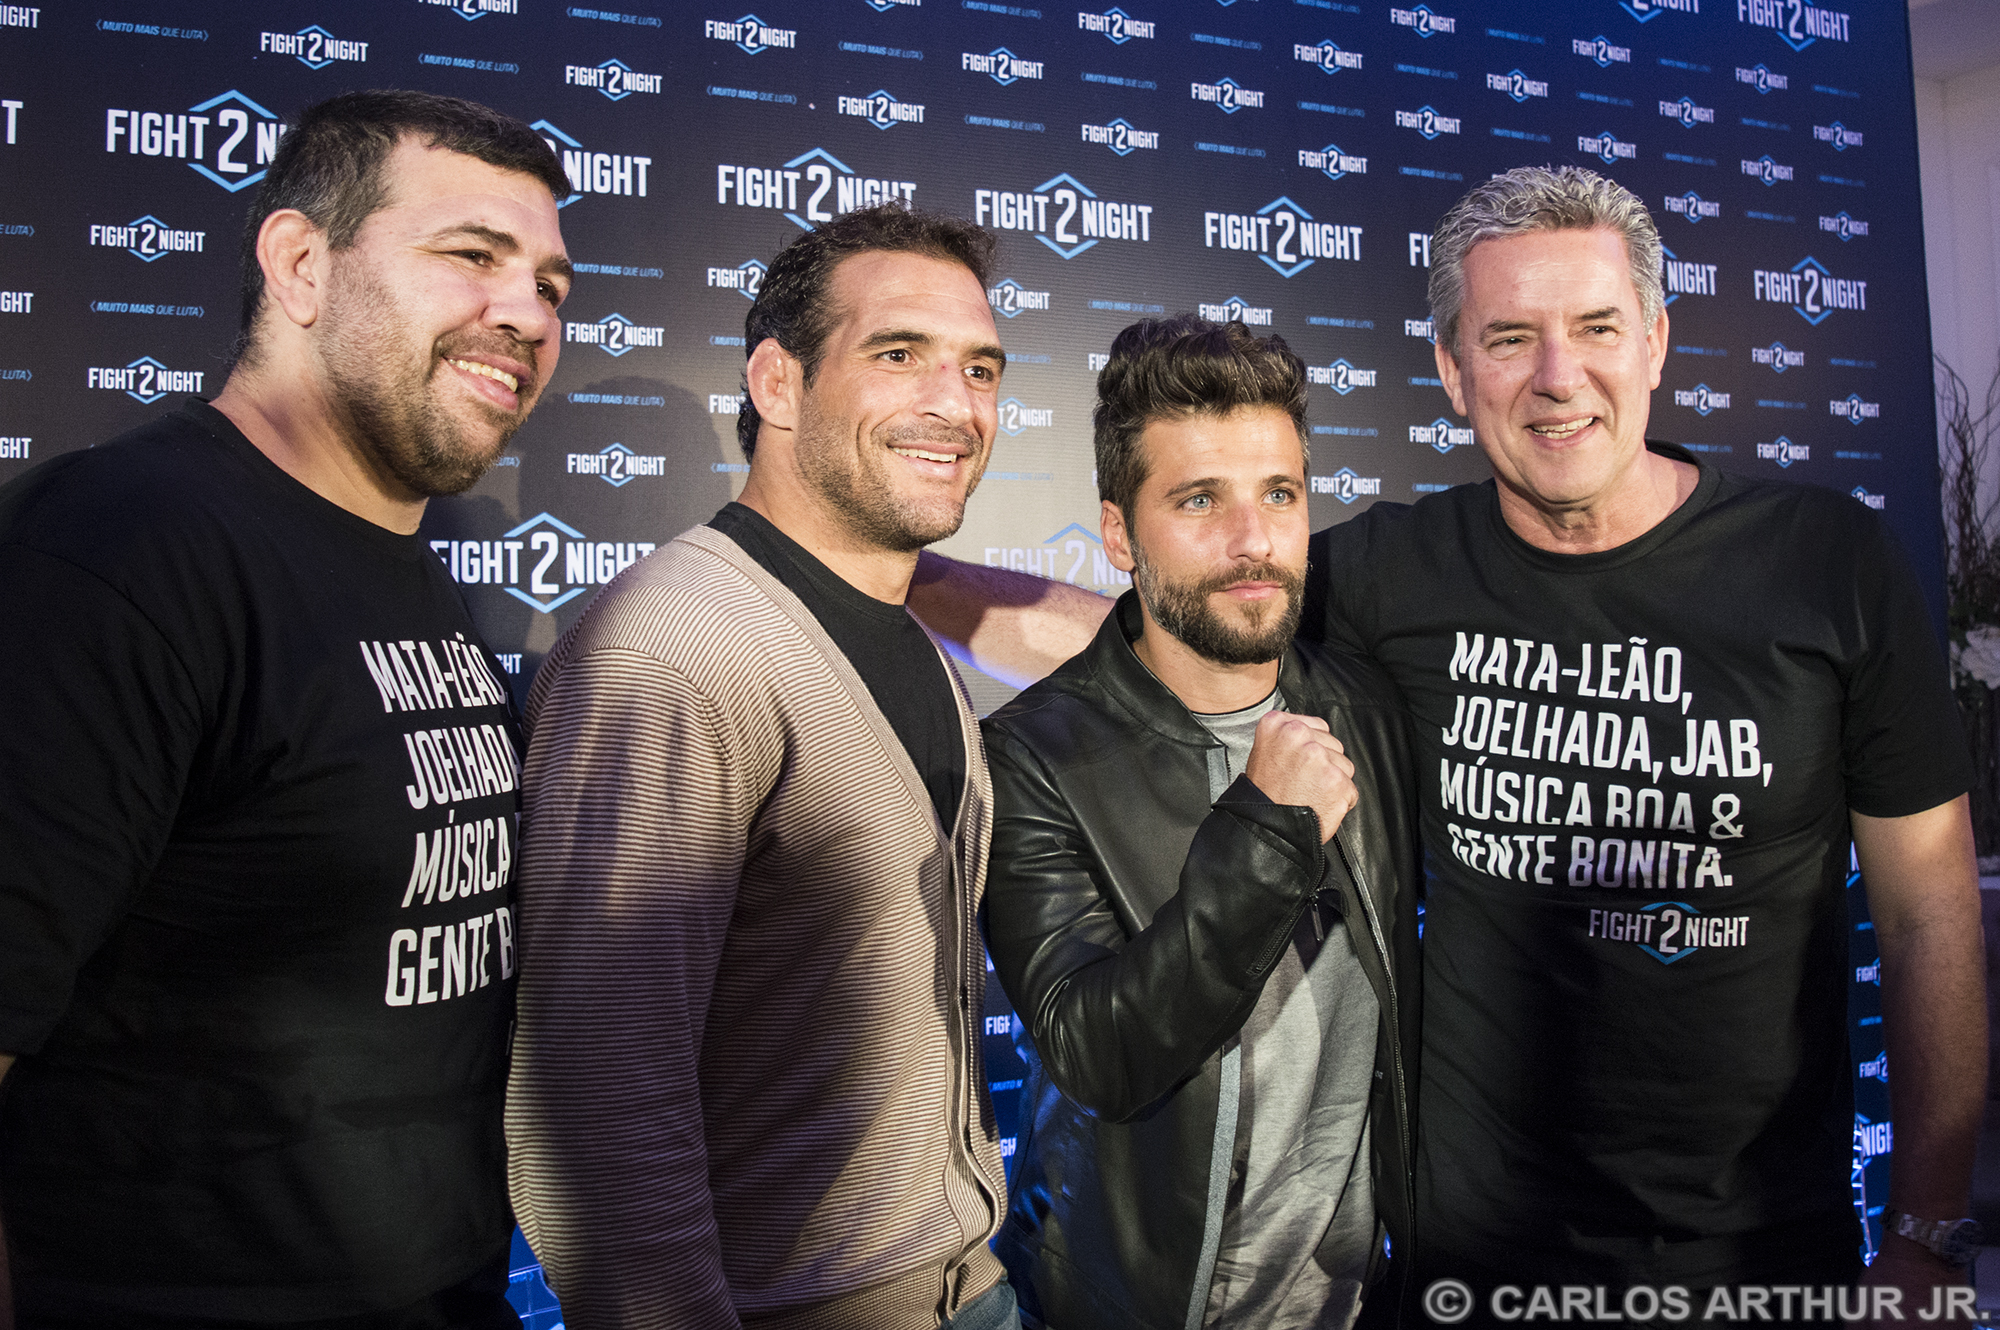 Pedro Rizzo, Léo Leite, Bruno Gagliasso e Roberto Baldaconni no lançamento do Fight2Nite. Foto: Carlos Arthur Jr.